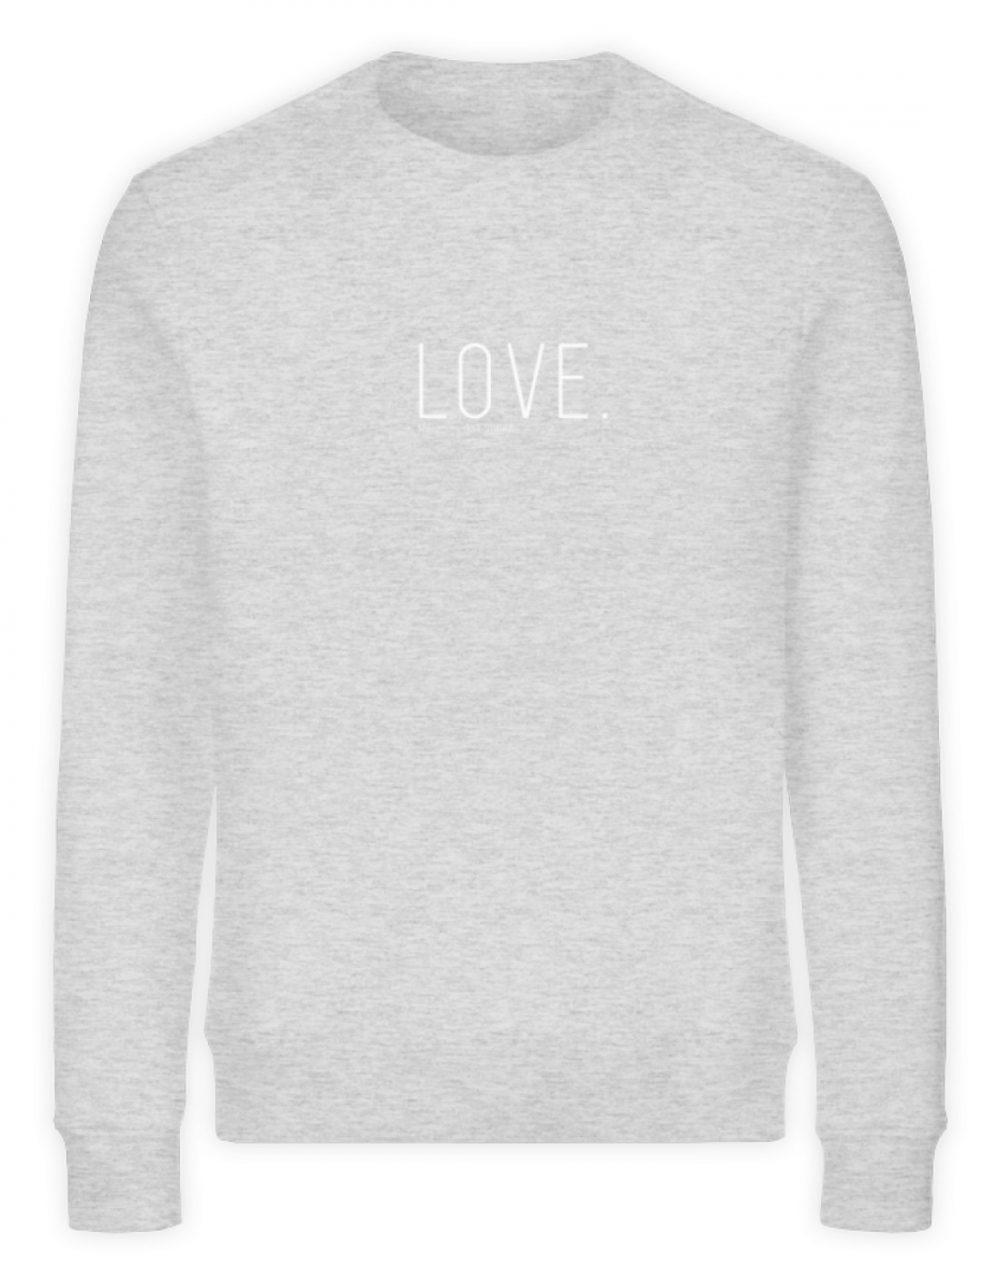 LOVE. - Unisex Organic Sweatshirt-6892